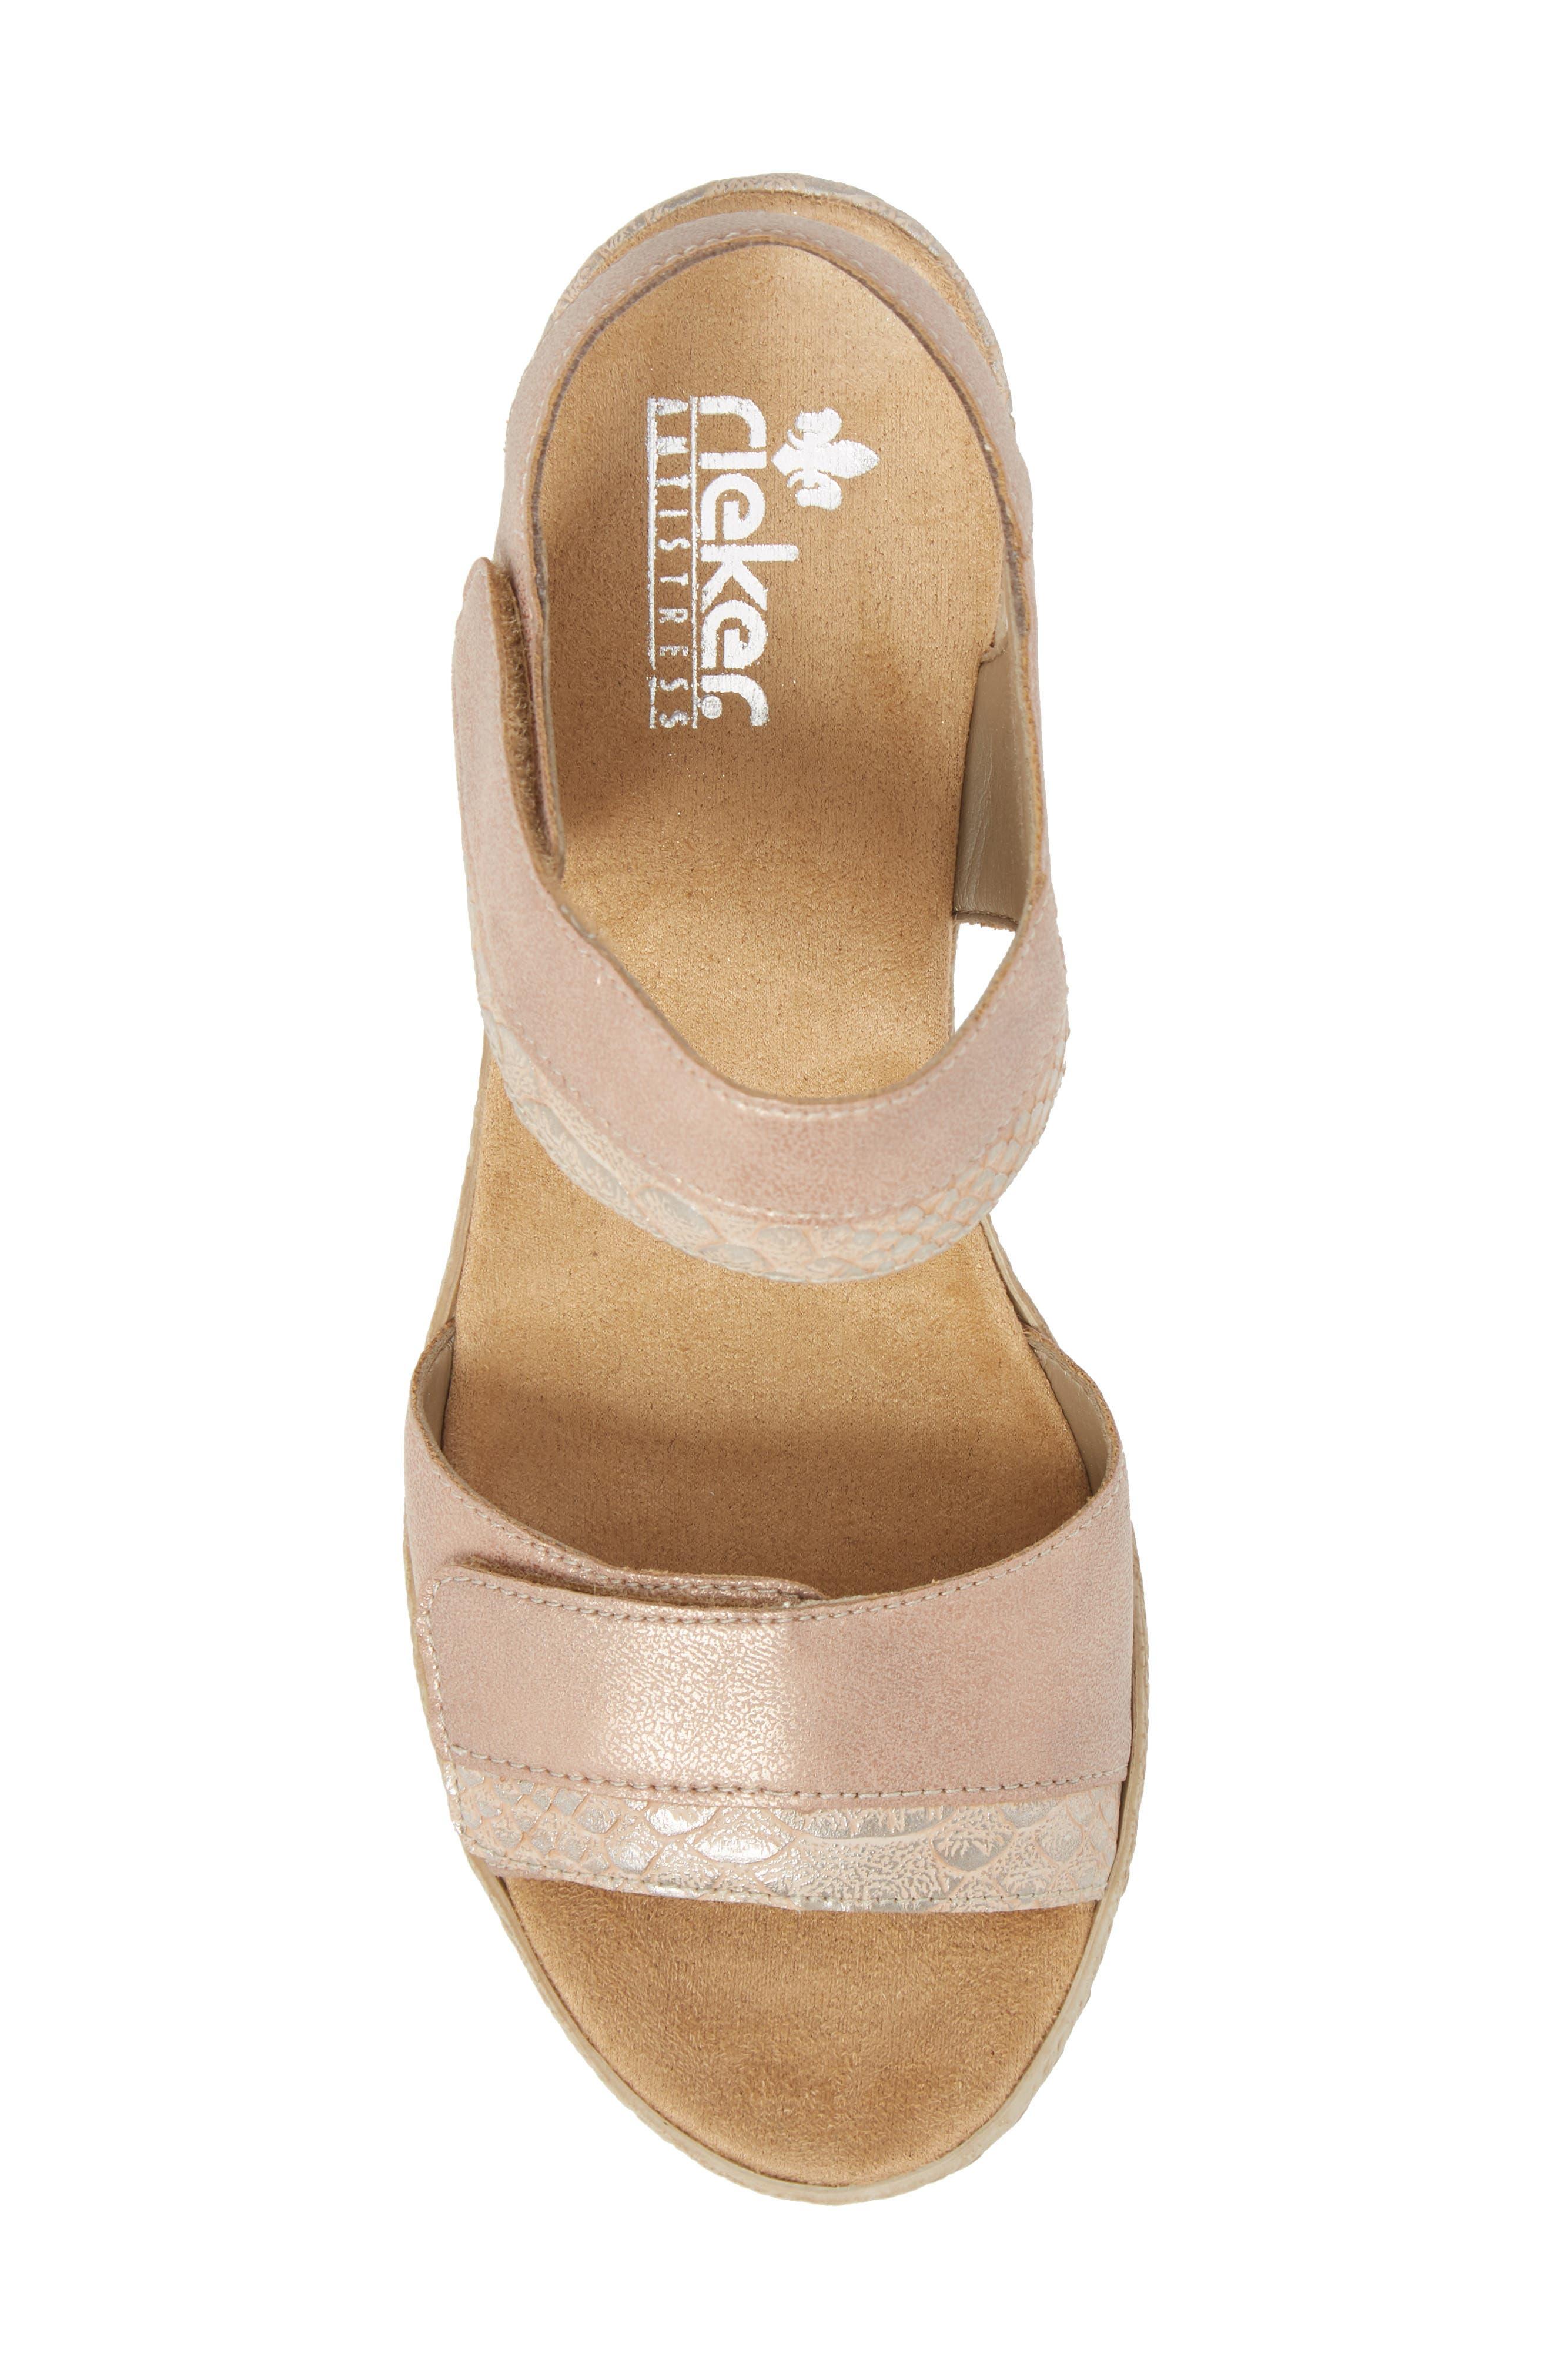 RIEKER ANTISTRESS,                             Fanni 70 Wedge Sandal,                             Alternate thumbnail 5, color,                             ROSE/ GINGER